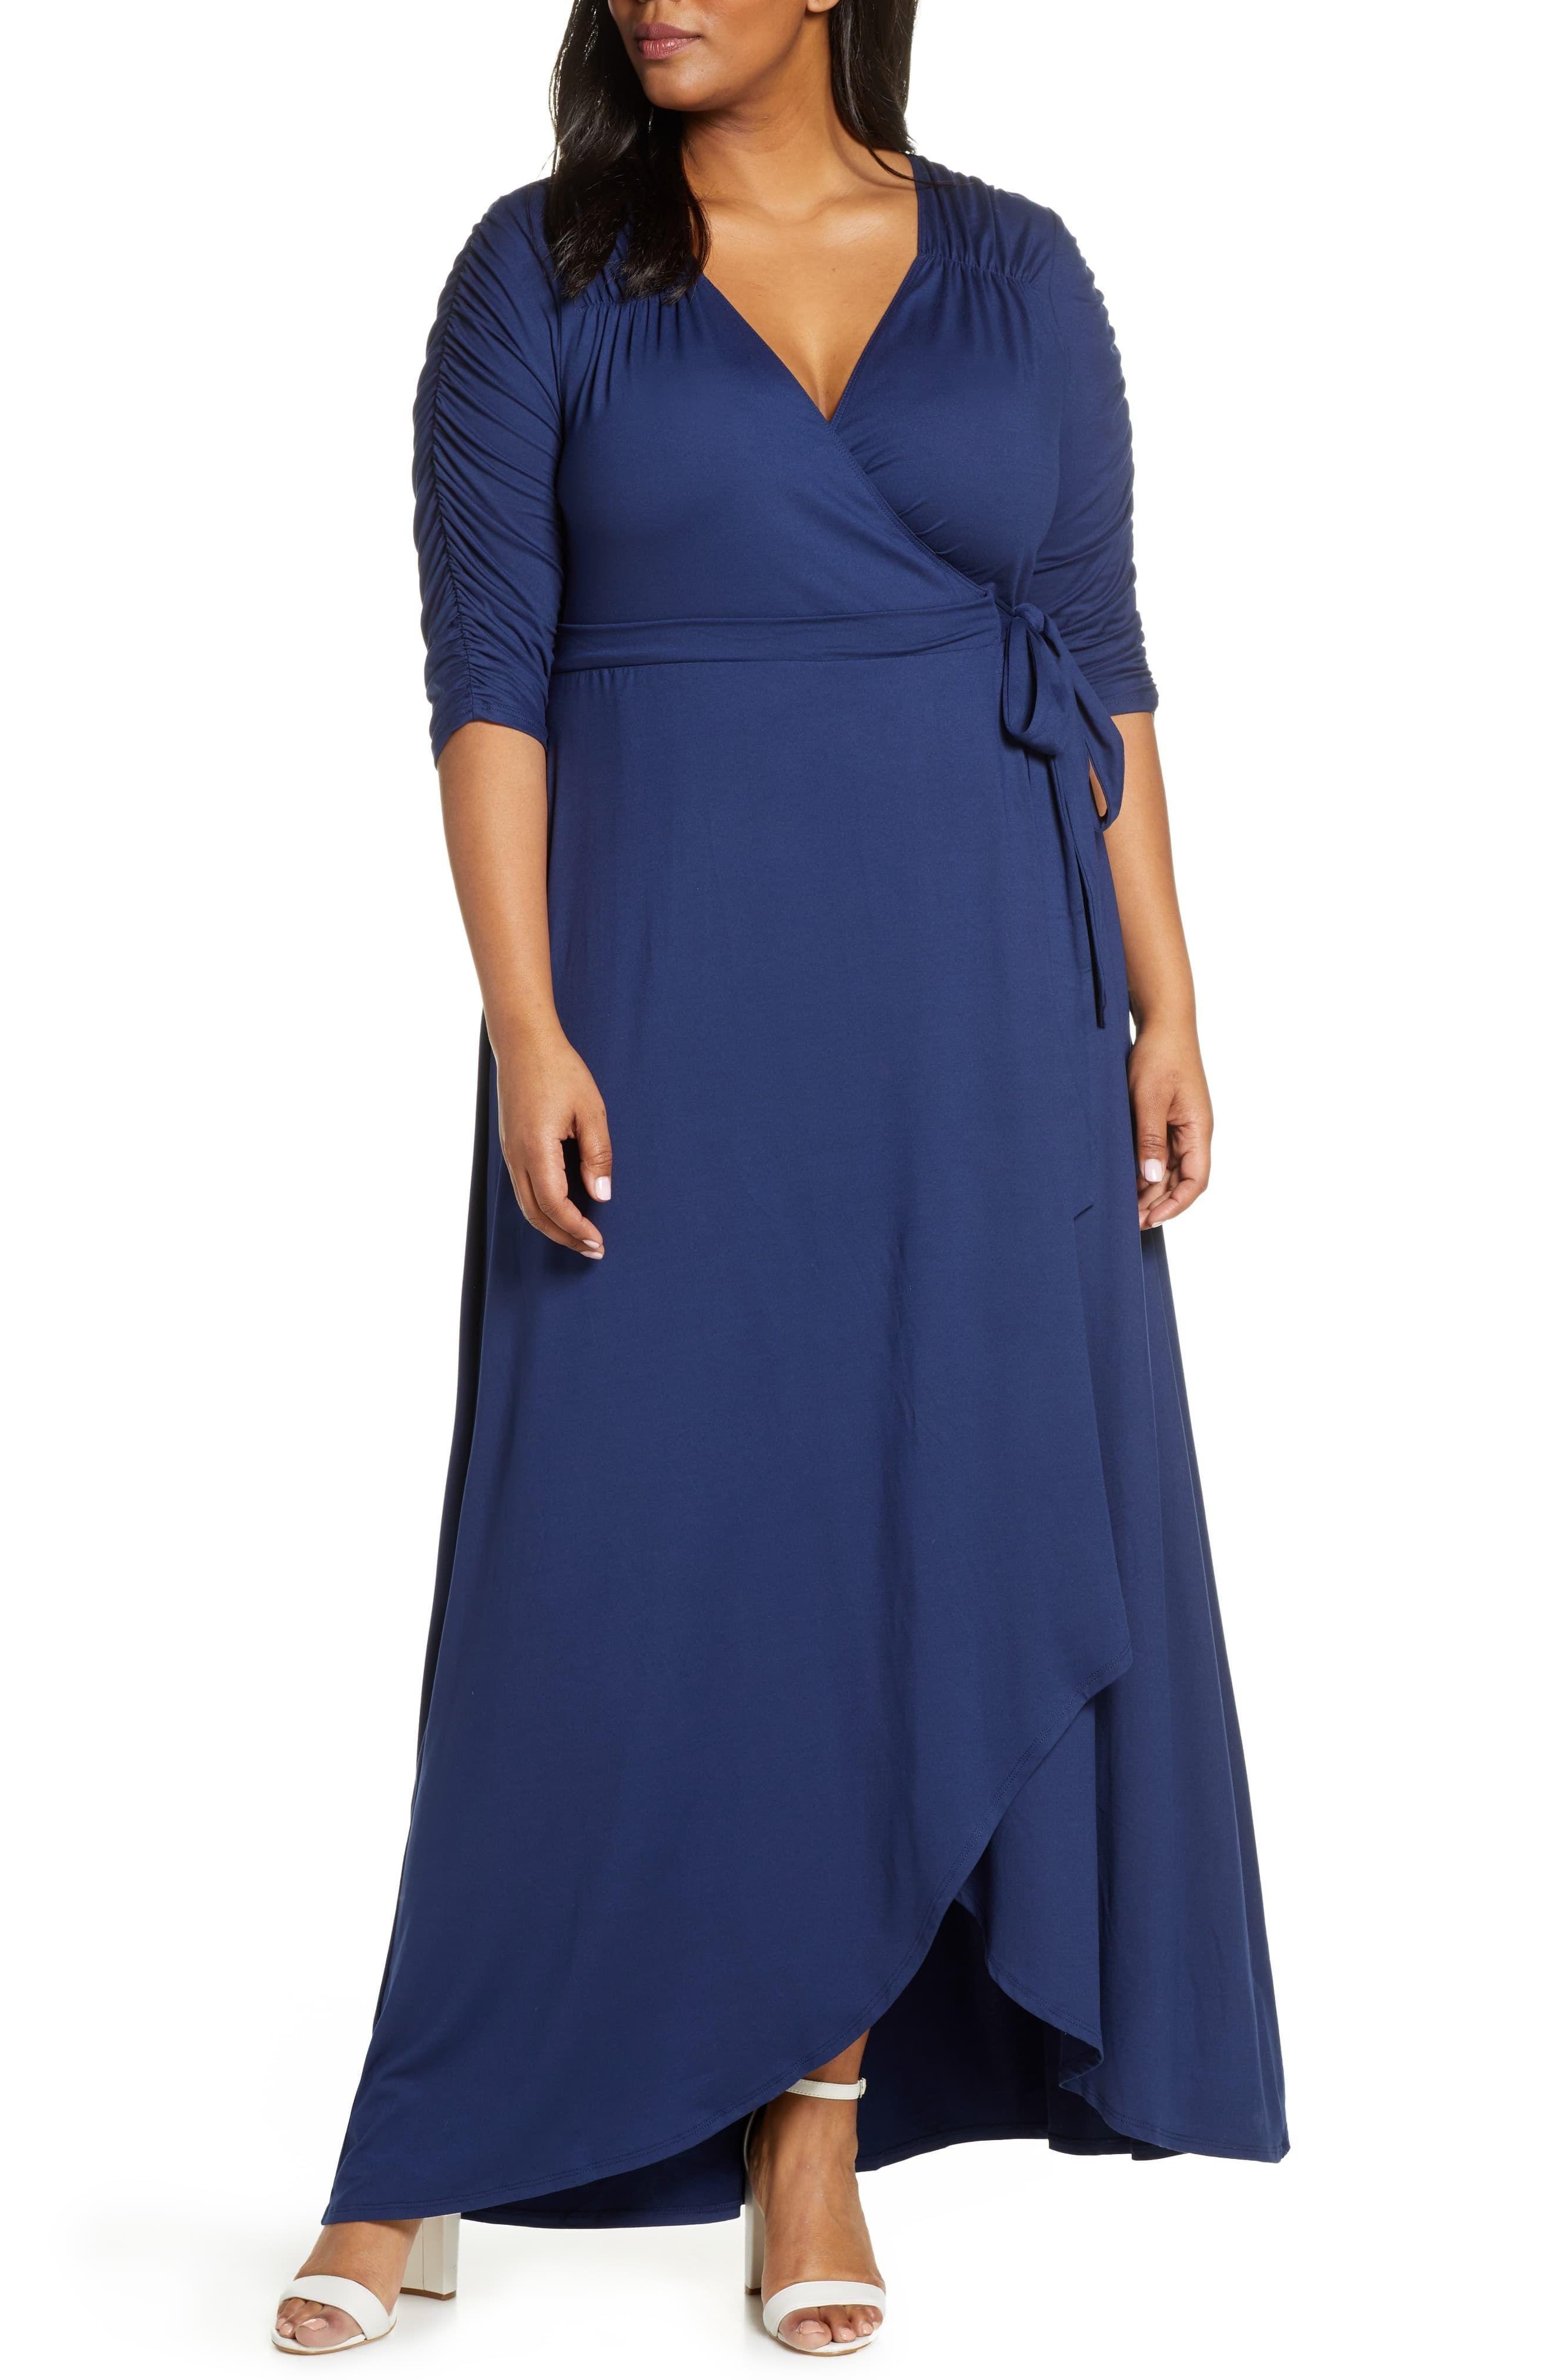 Kiyonna Meadow Dream Wrap Maxi Dress Plus Size Plus Size Maxi Dresses Maxi Dress Plus Size Black Dresses [ 4048 x 2640 Pixel ]